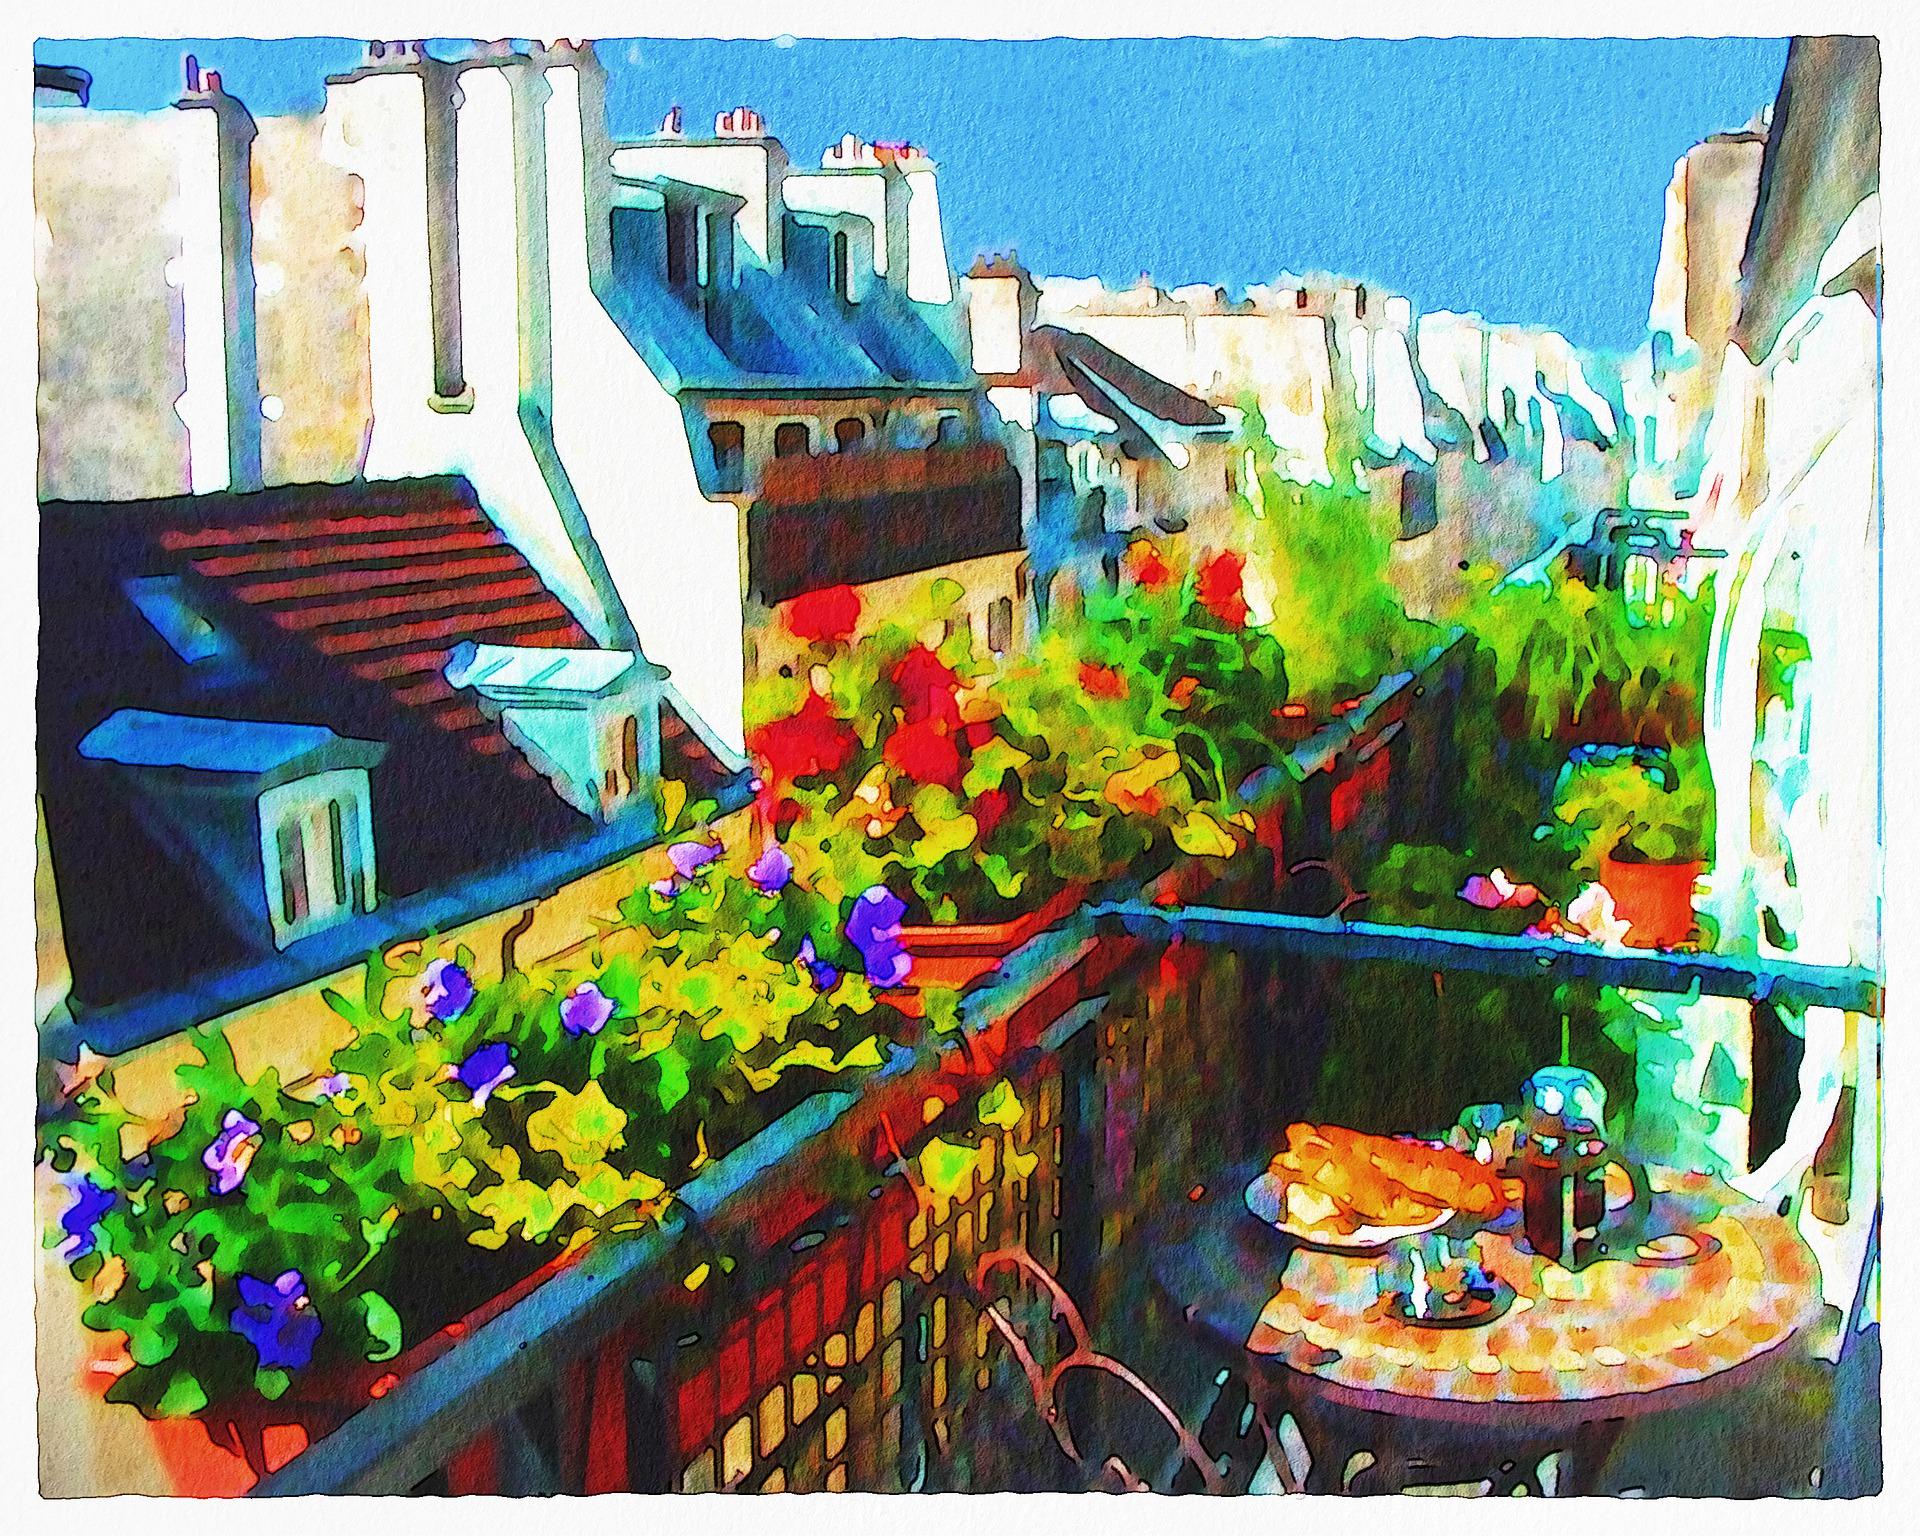 , The 10 best fragrant plants for the garden & balcony, Best Garden, Home And DIY Tips